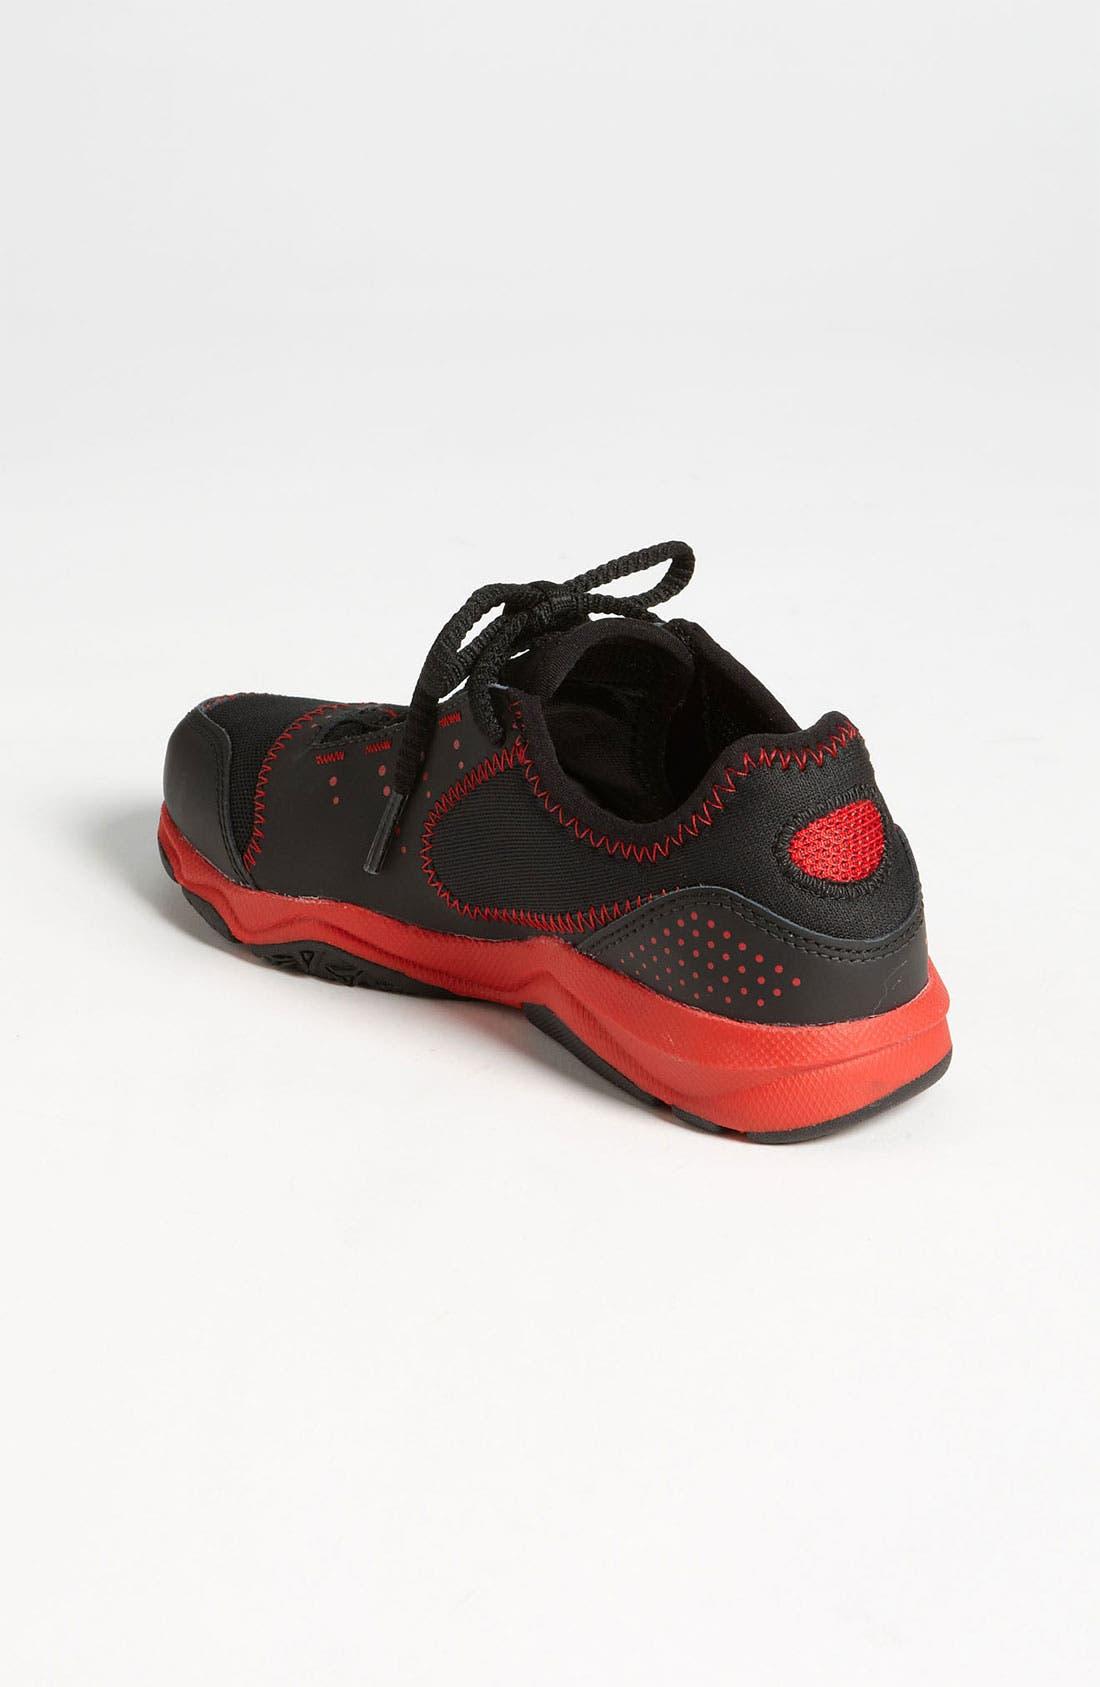 Alternate Image 2  - Under Armour 'Defend' Sneaker (Toddler, Little Kid & Big Kid)